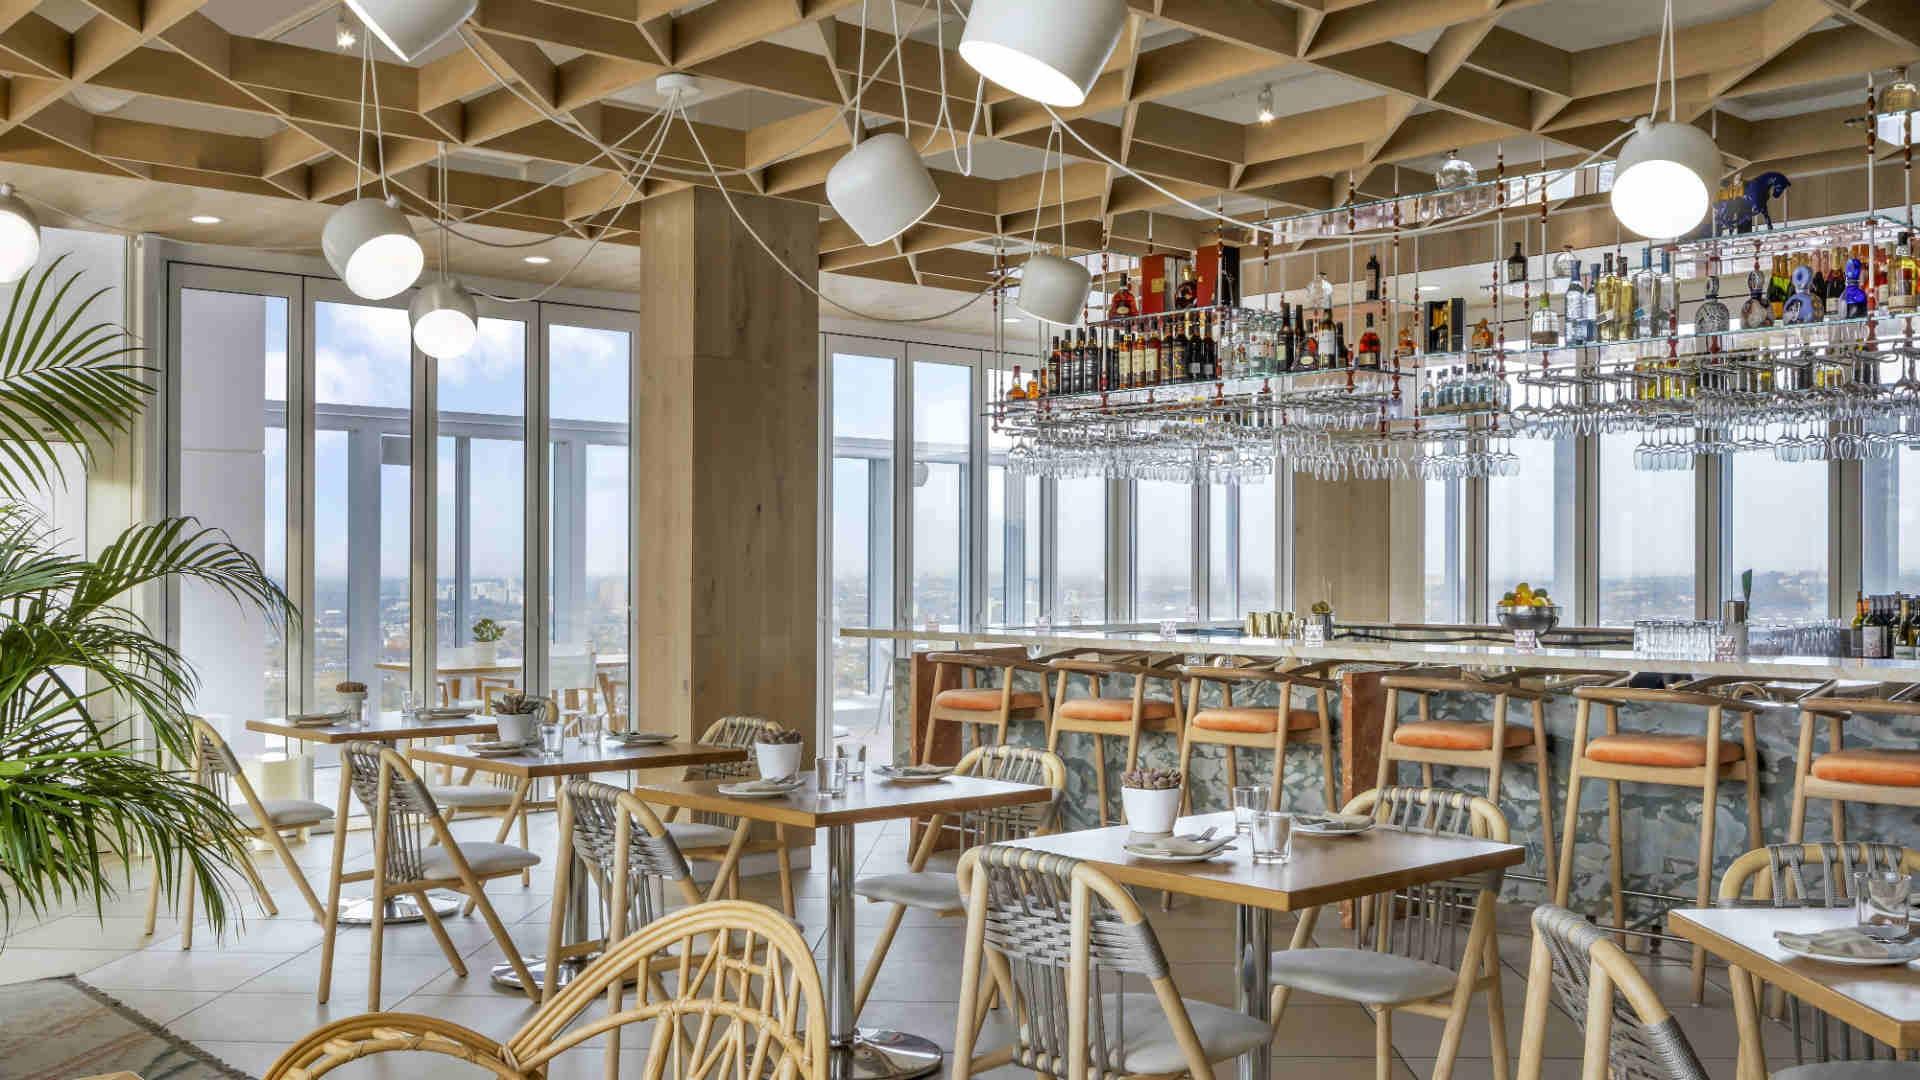 Best hotels Toronto staycation | The Bisha Hotel rooftop restaurant KŌST